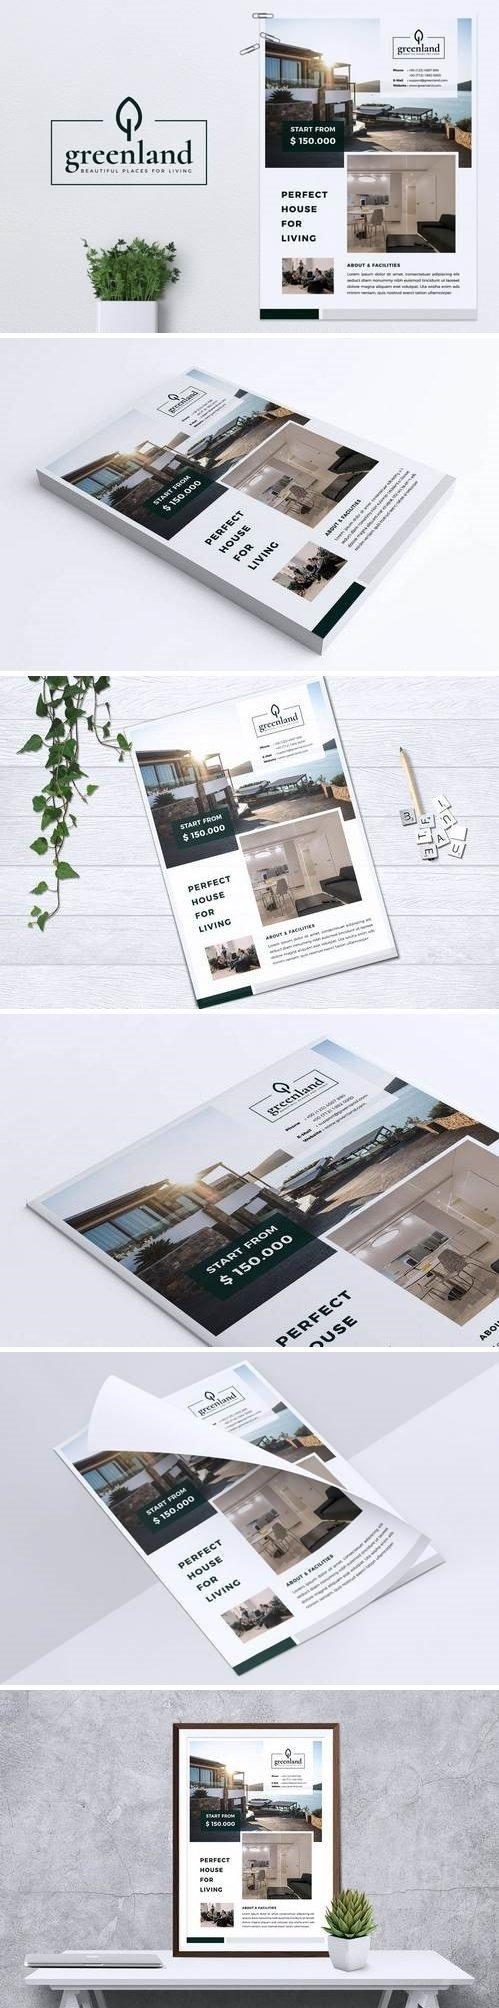 GREENLAND Real Estate Flyer